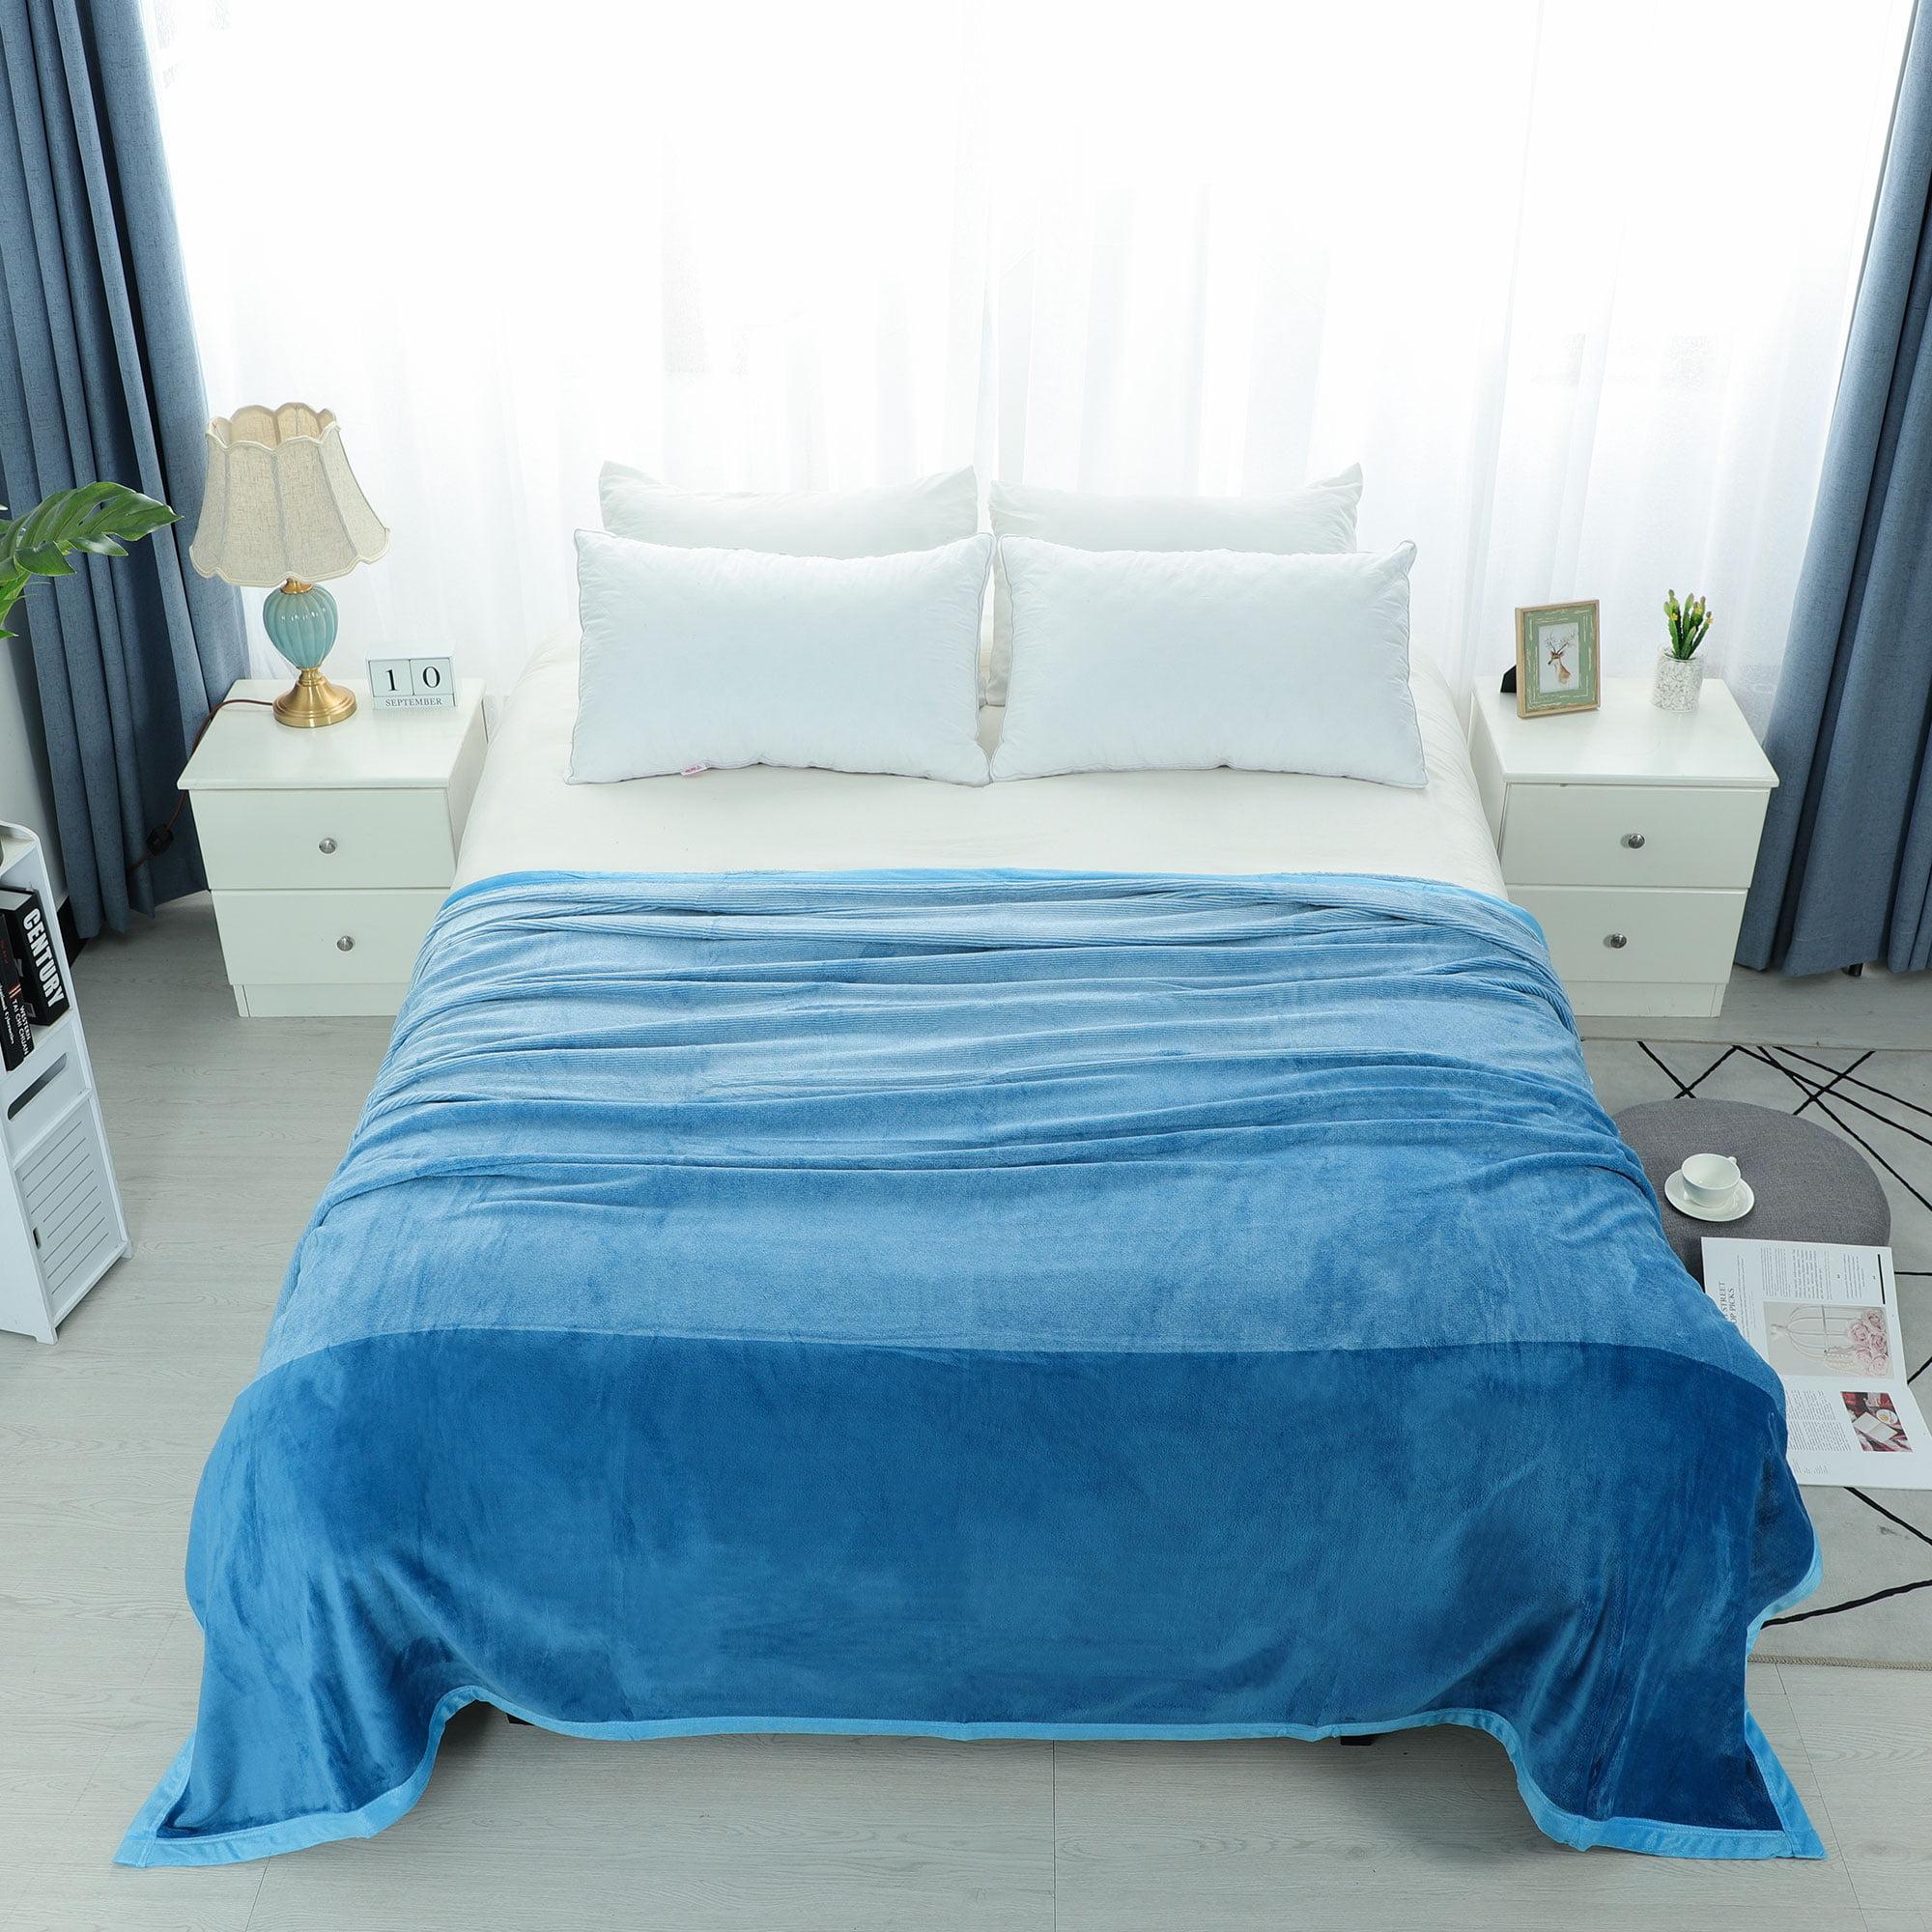 Flannel Fleece Blanket Soft Warm Microfiber Plush Solid Blankets Blue King